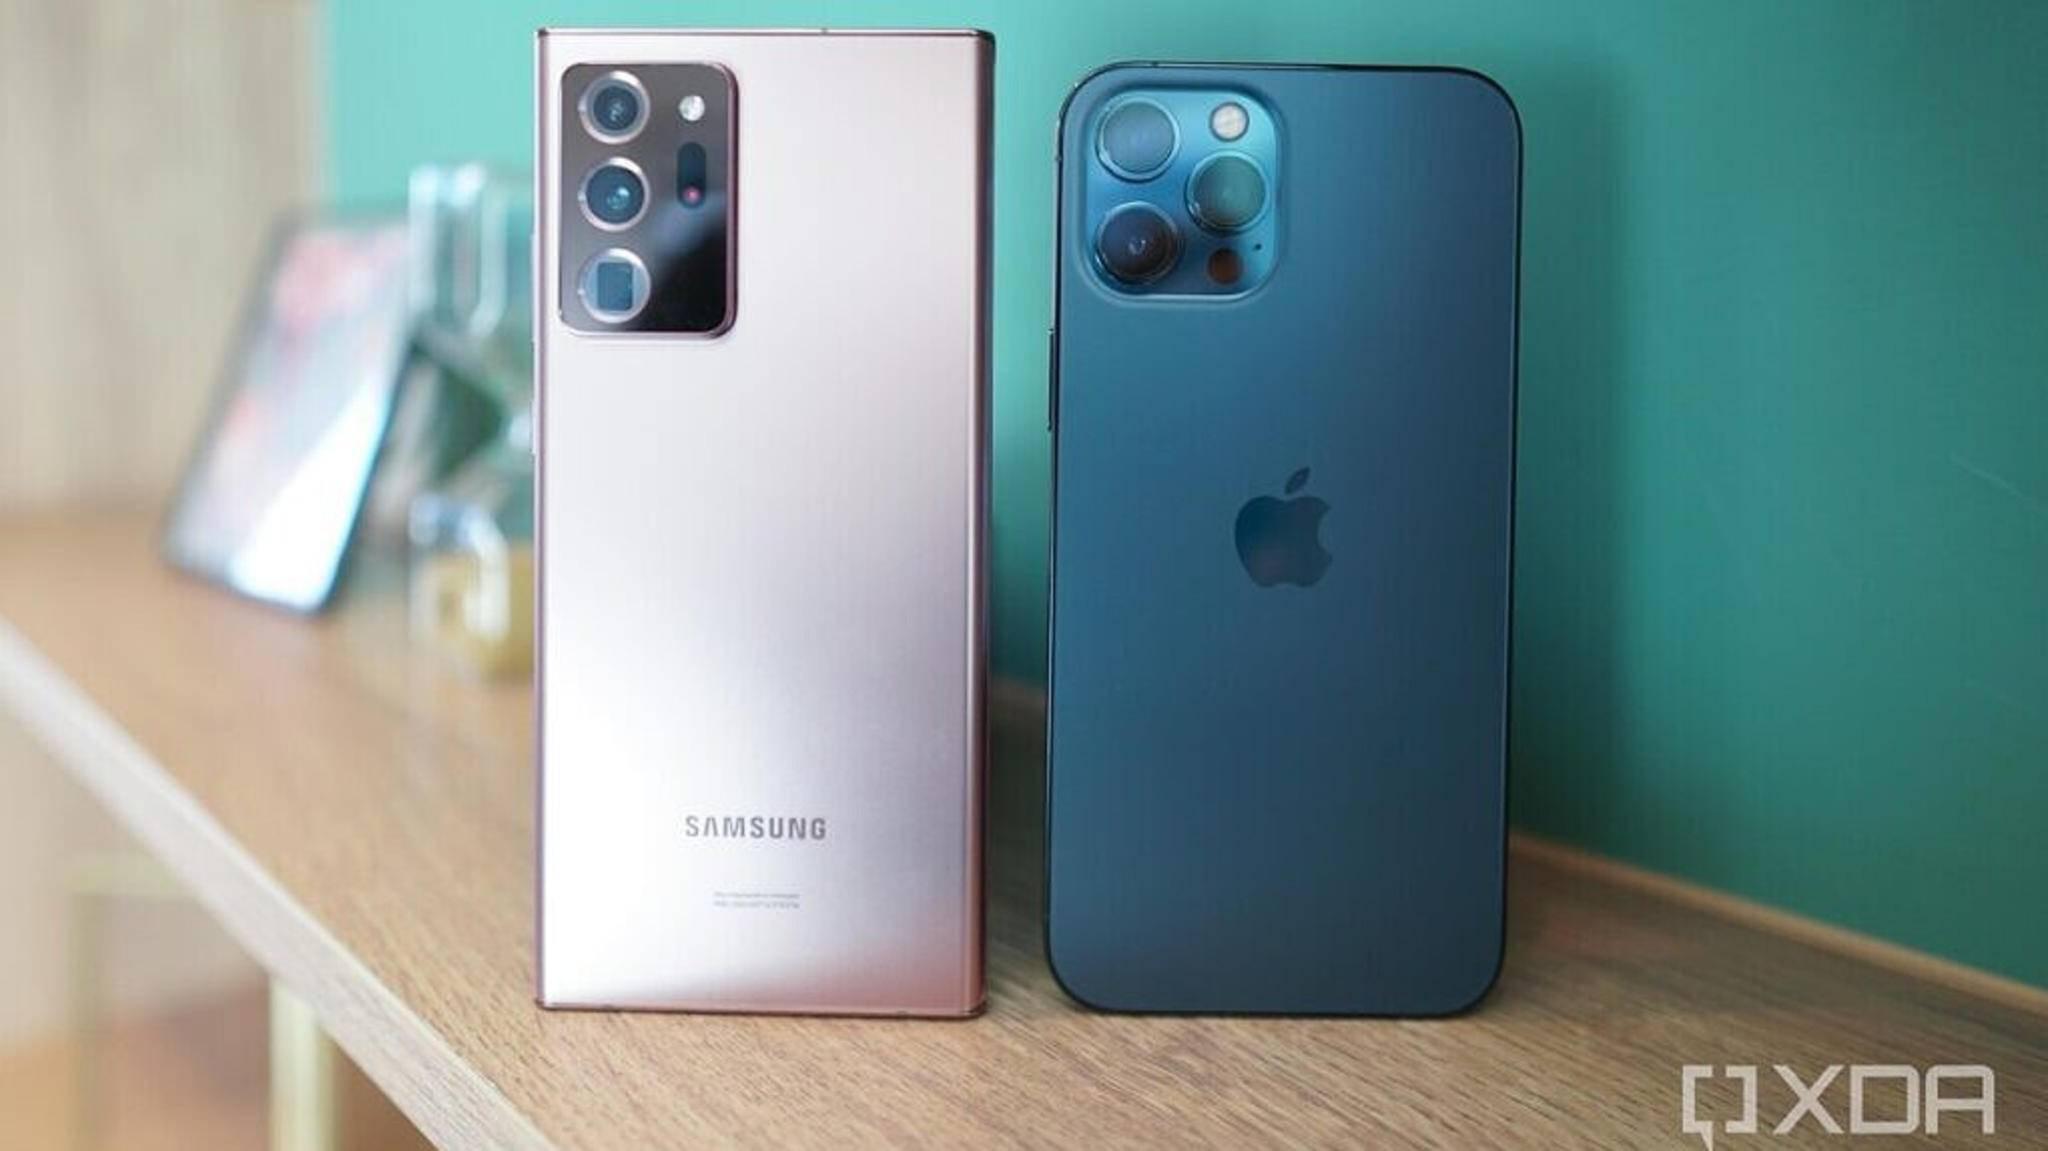 note-20-ultra-vs-iphone-12-pro-max-kameravergleich-xda